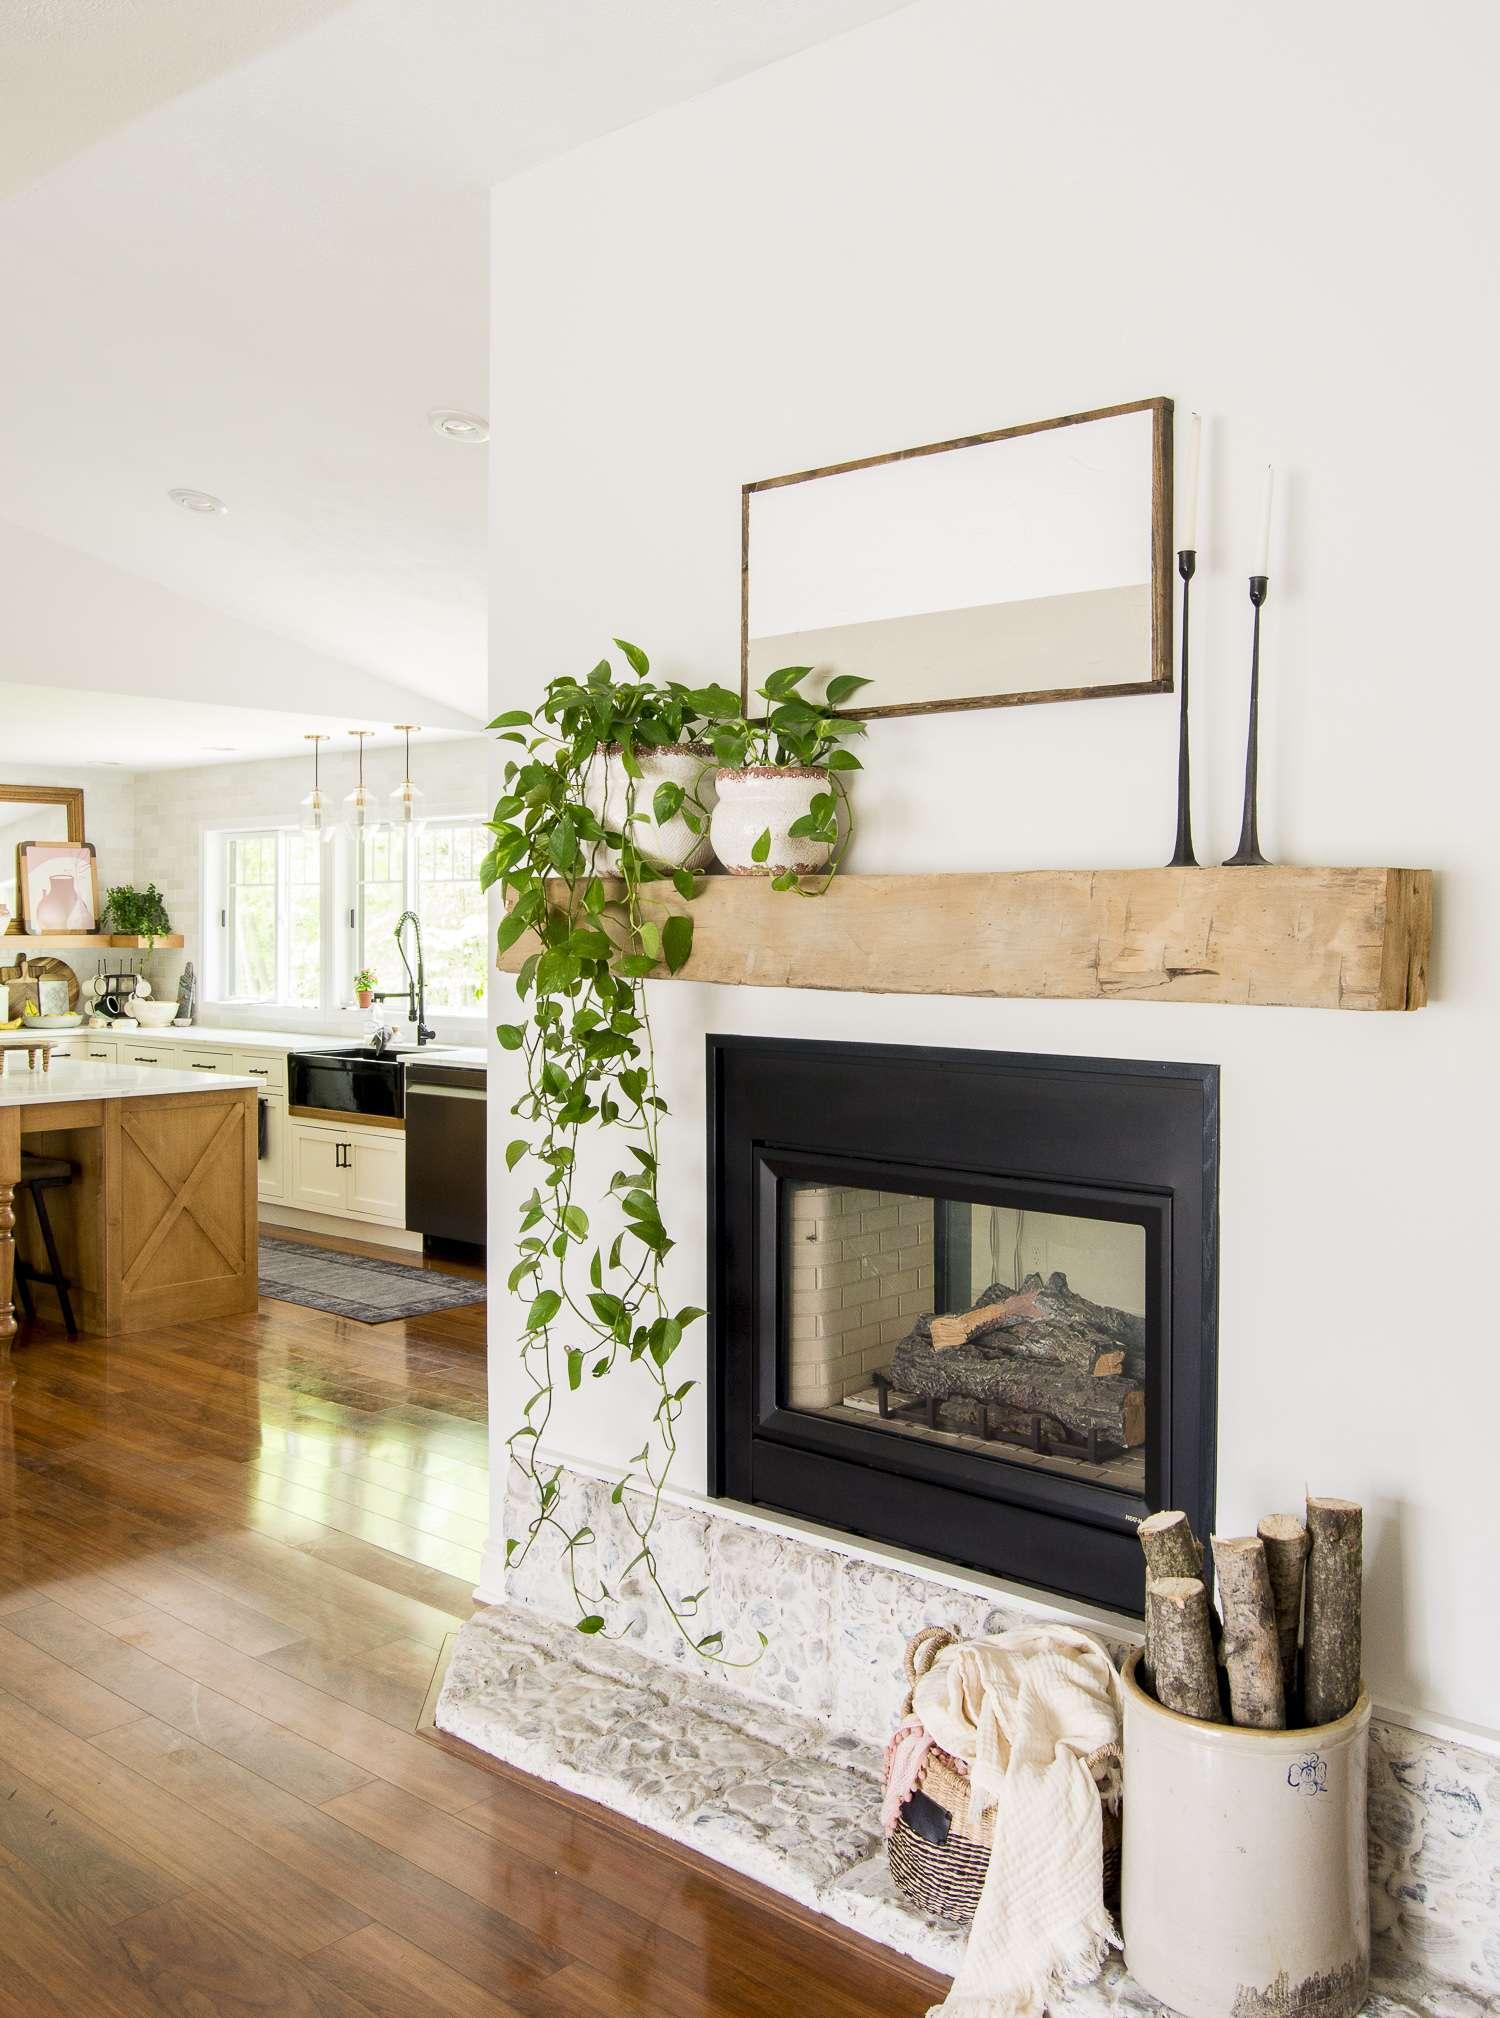 Candle sticks on a fireplace.